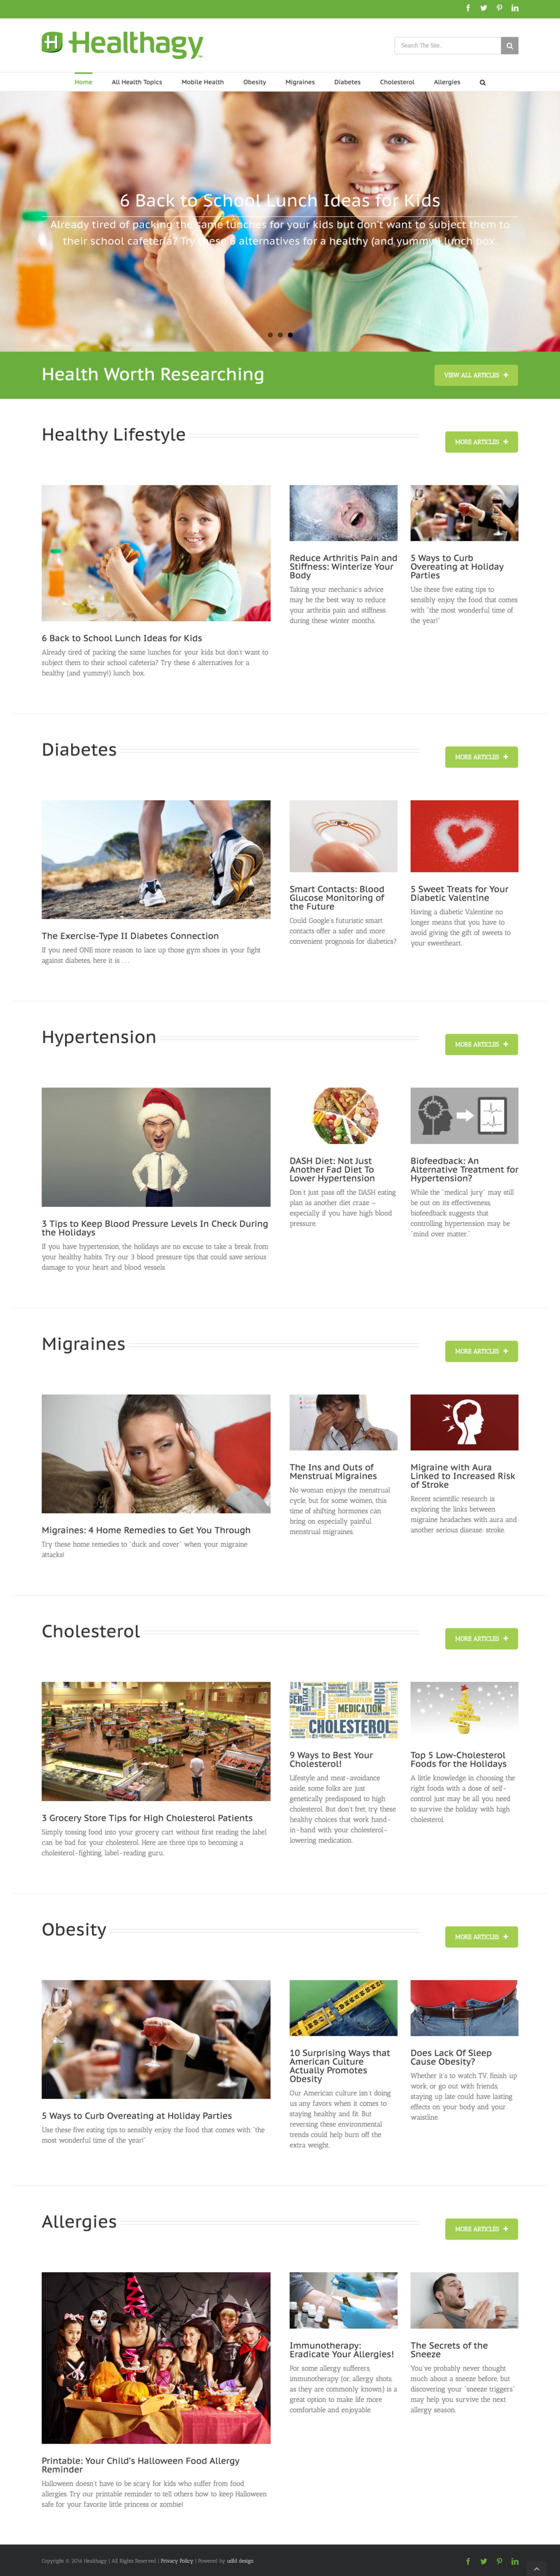 Healthagy Health Articles